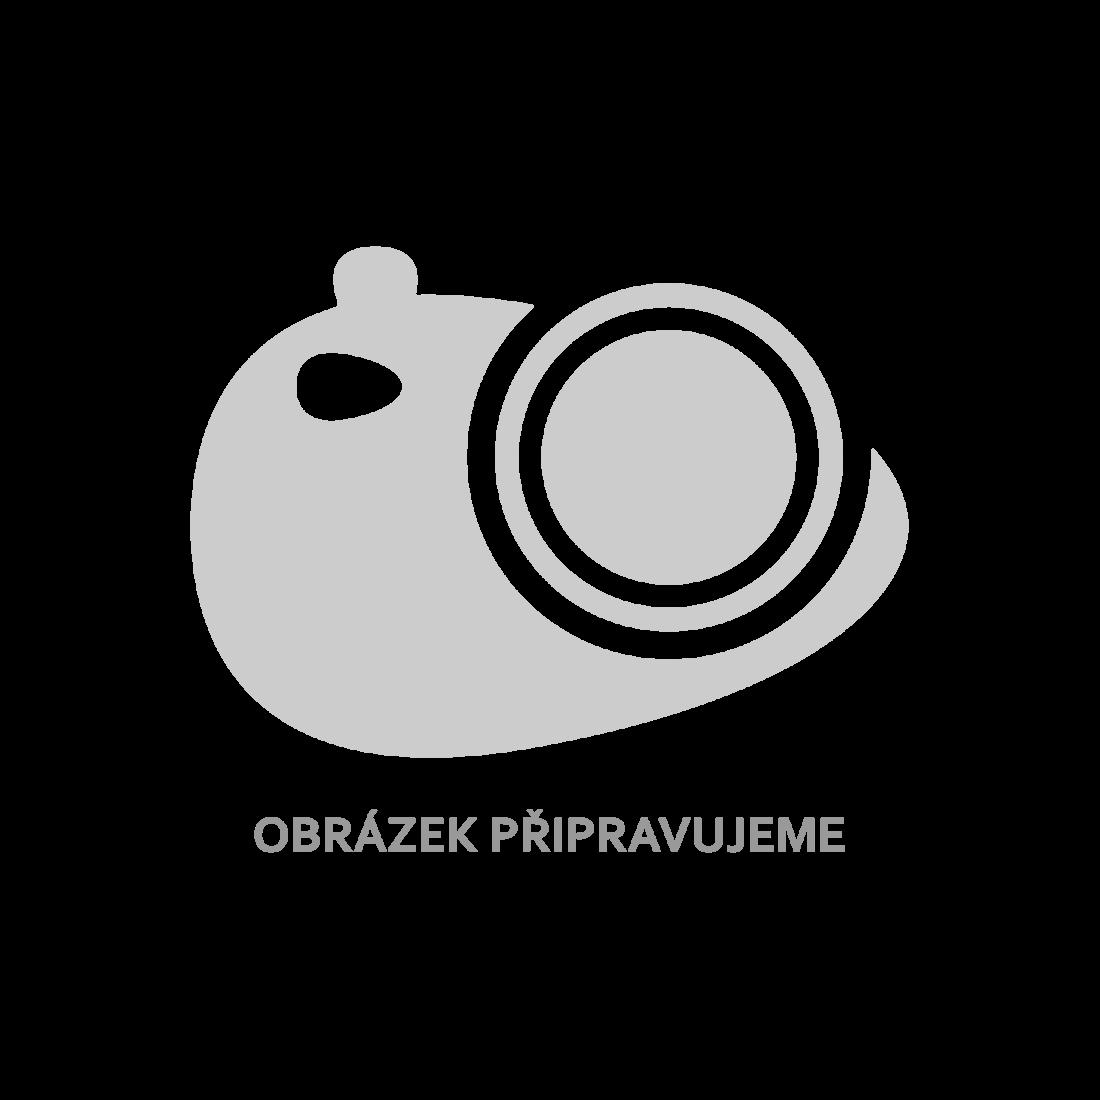 vidaXL Psací stůl bílý a dub sonoma 80 x 45 x 74 cm dřevotříska [801369]